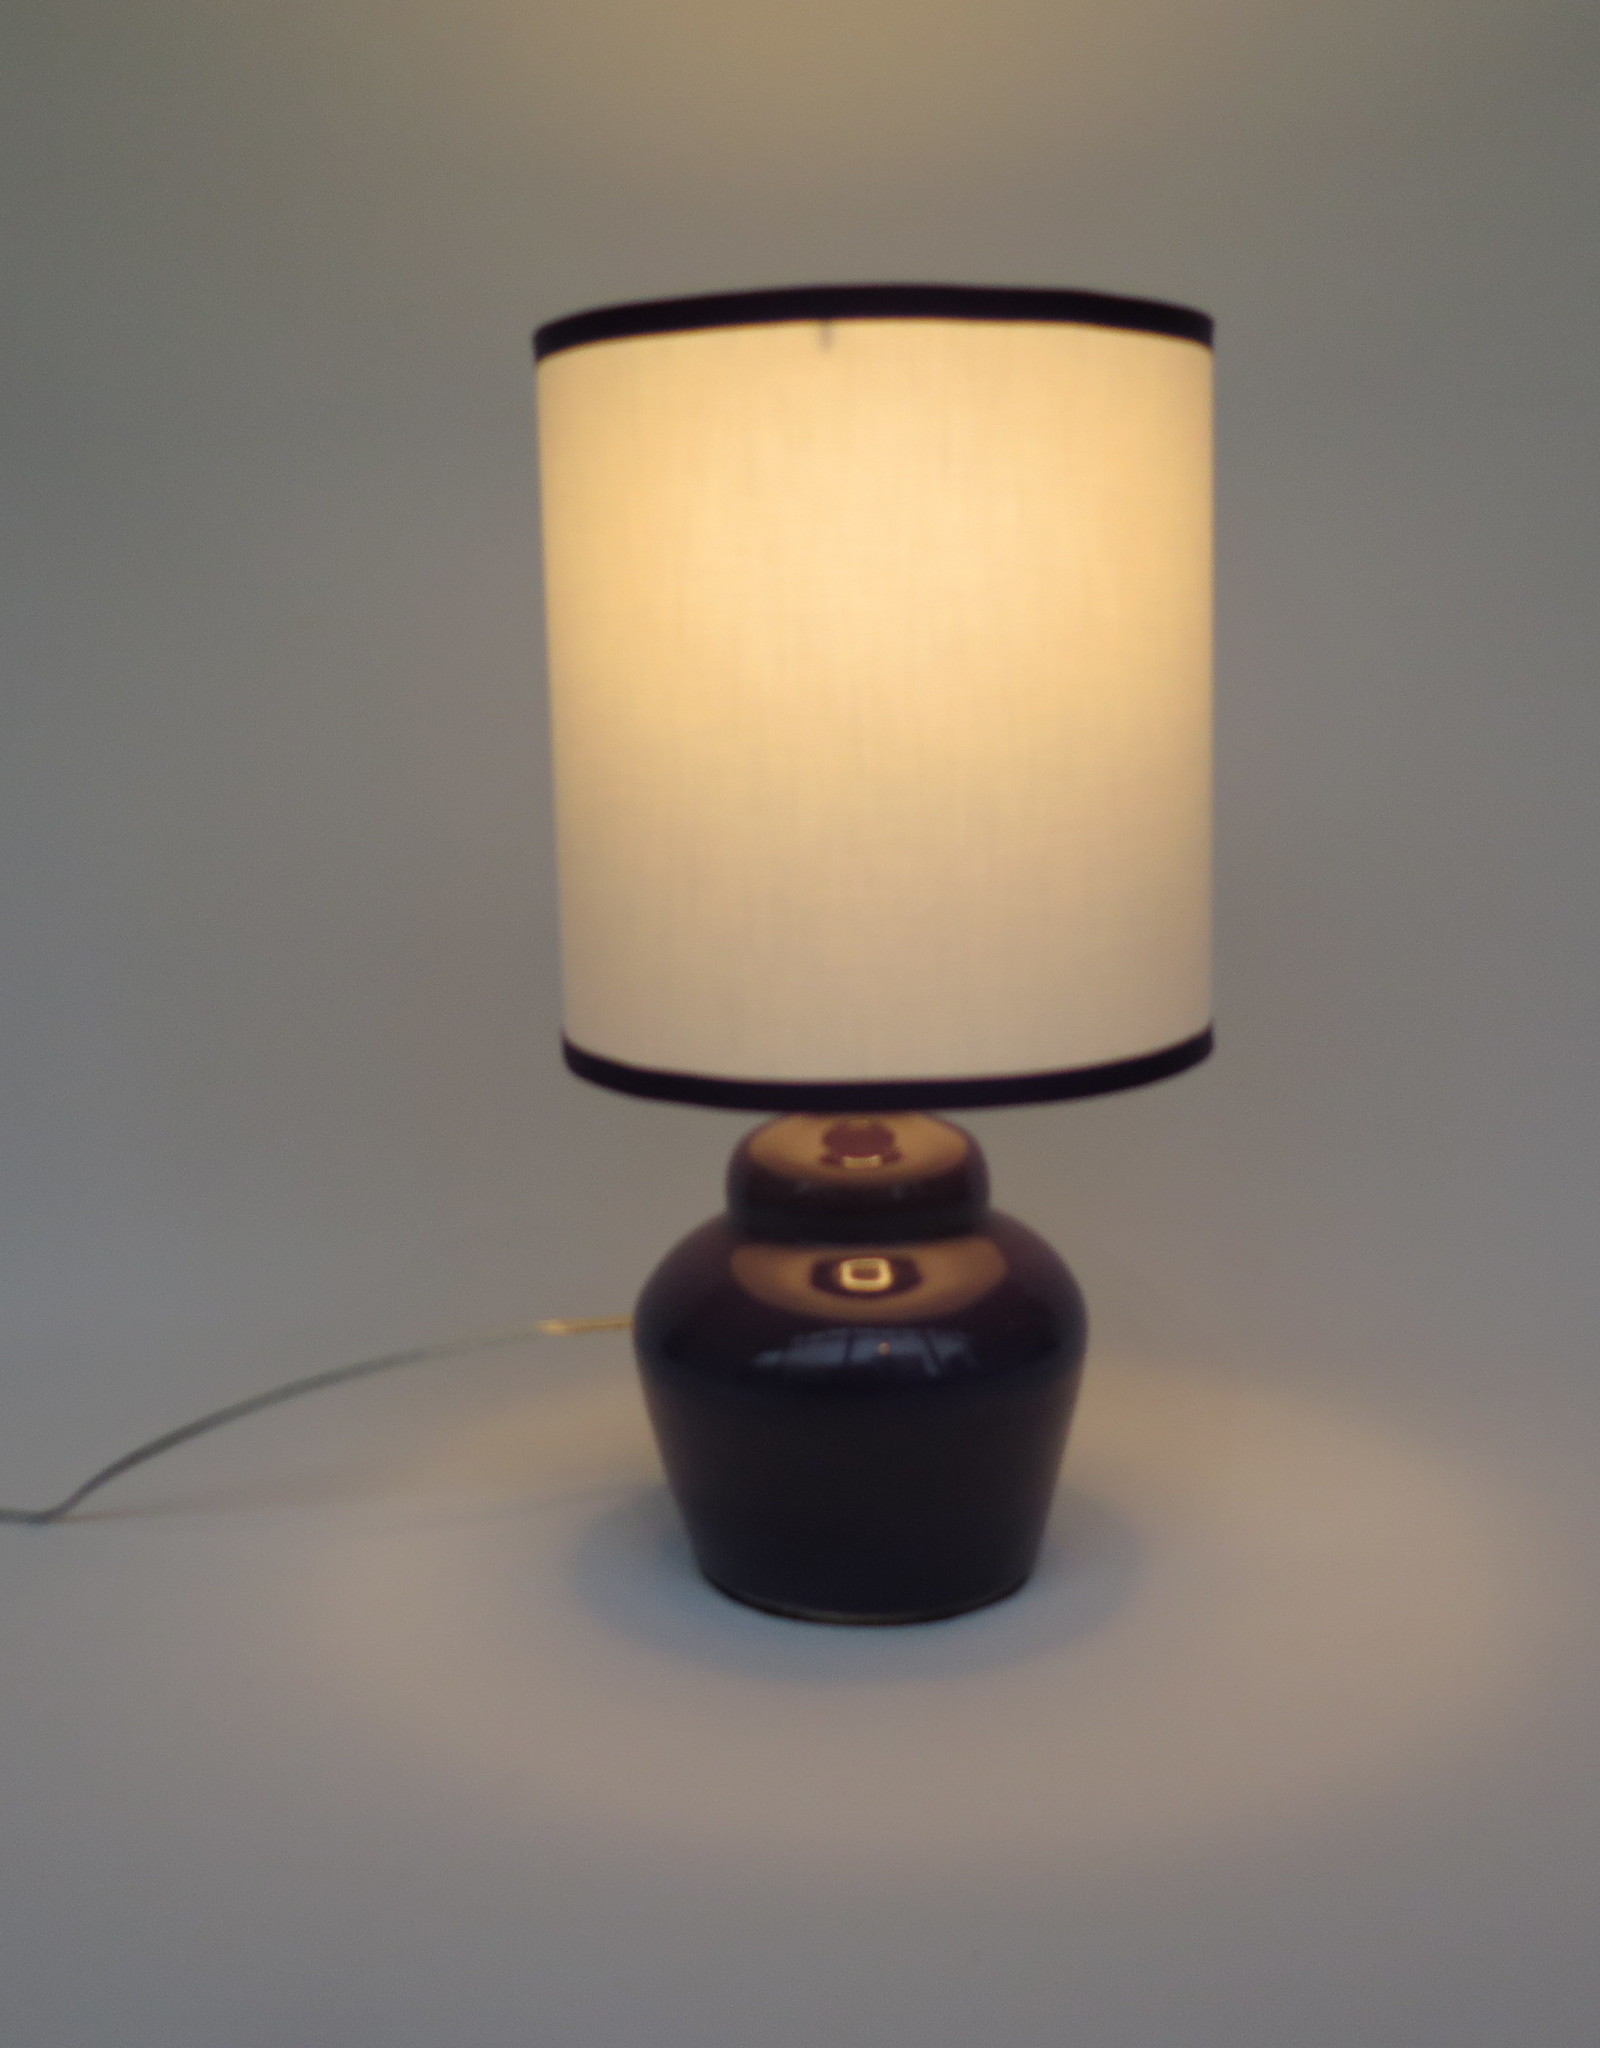 Small plump purple lamp by Ronda Ruby ceramics